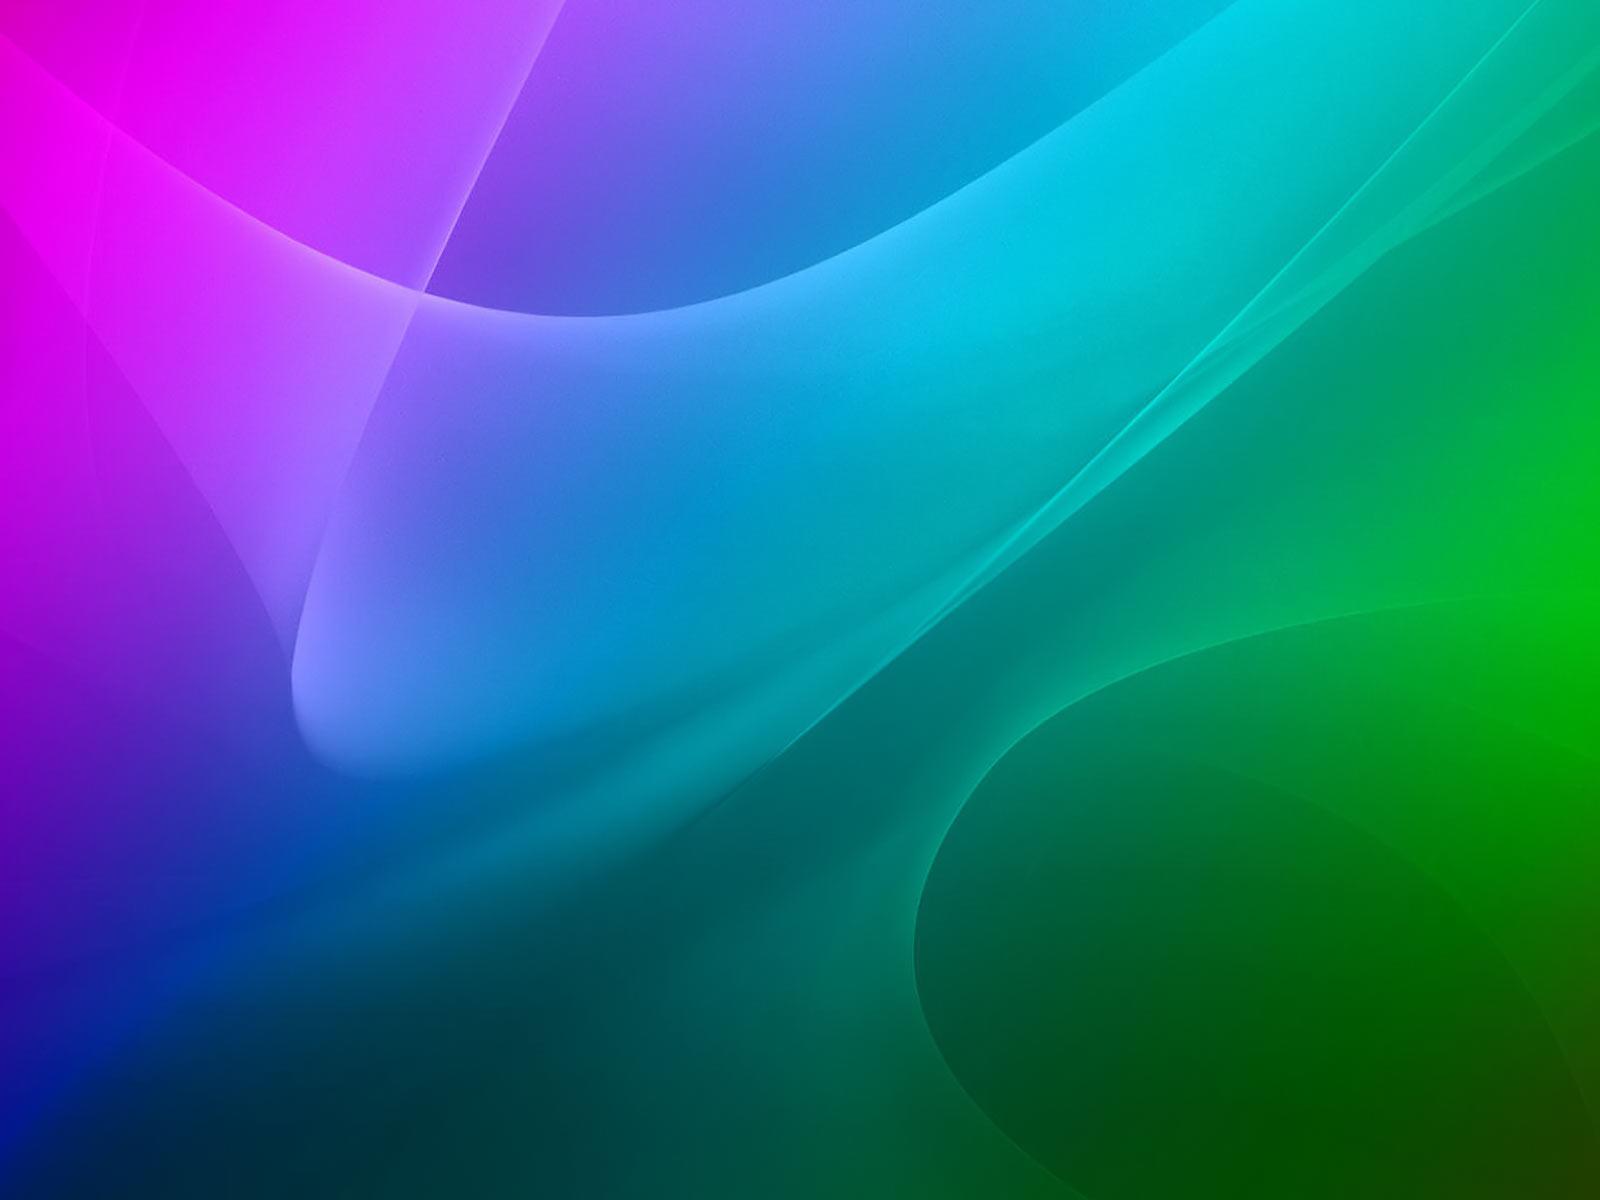 Free Download Background Clipart Download Clip Art Clip 1600x1200 For Your Desktop Mobile Tablet Explore 71 Background Clipart Clipart Wallpaper Background Clipart Wallpaper Clipart